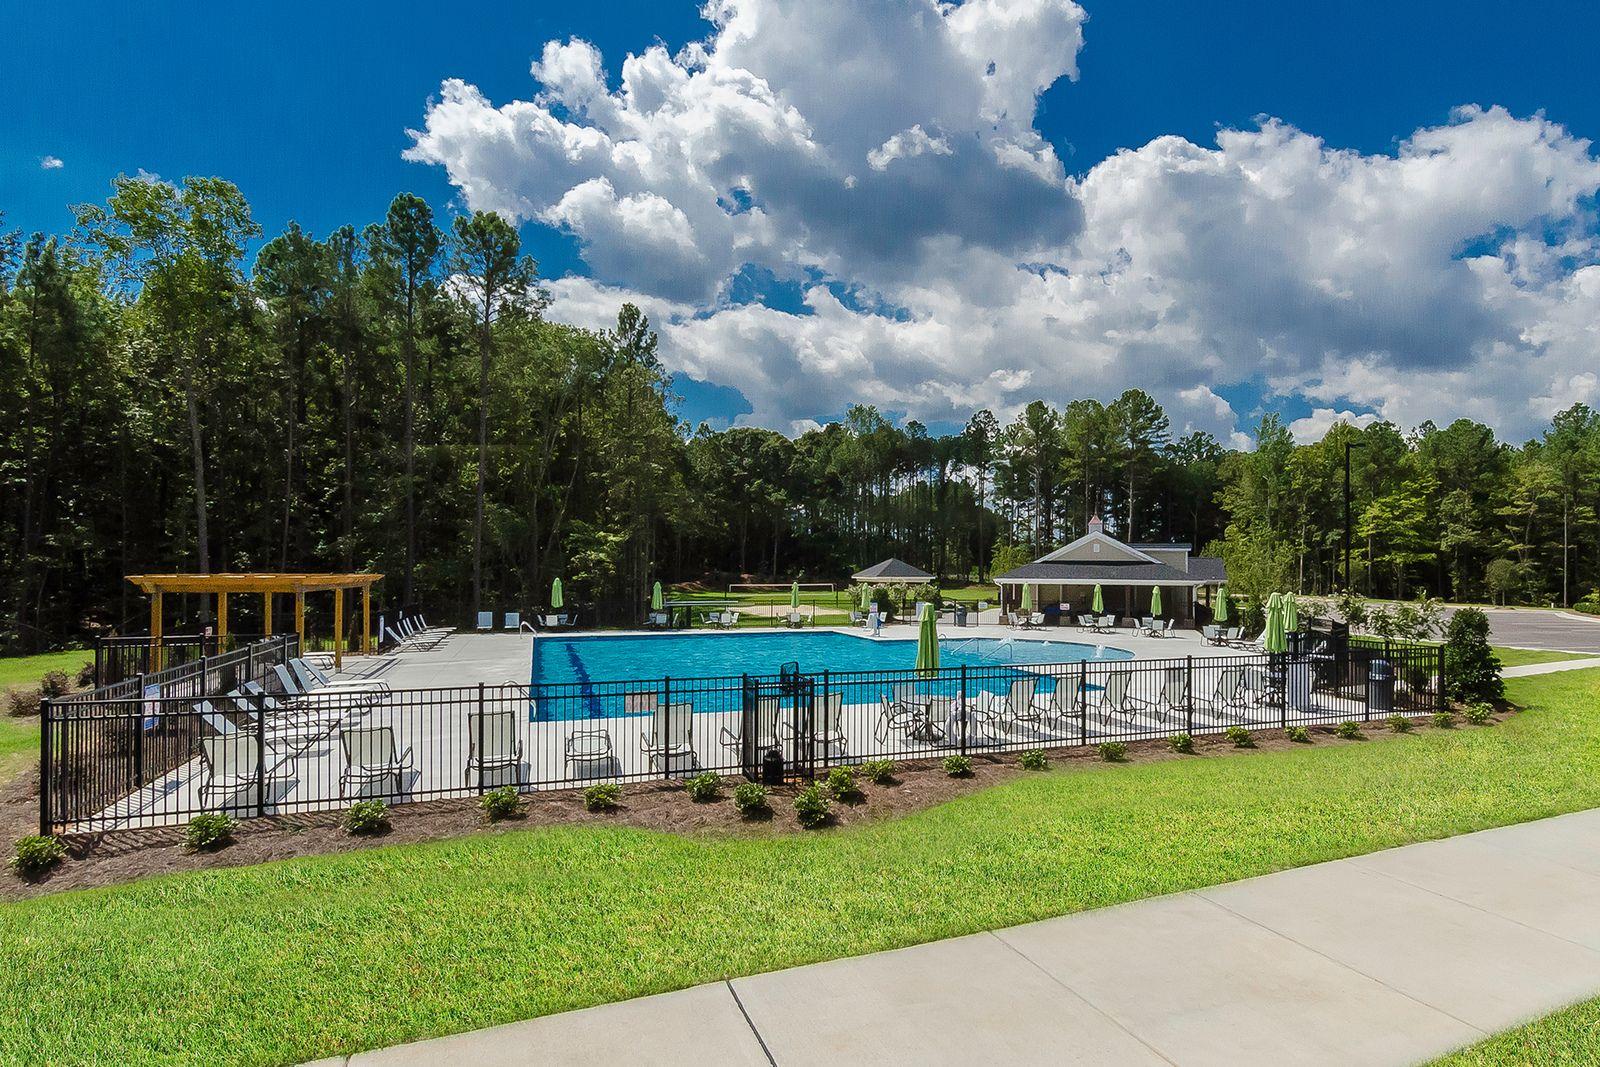 Single Family for Active at Avalon Isle 2763 Jordan Pointe Blvd New Hill, North Carolina 27562 United States